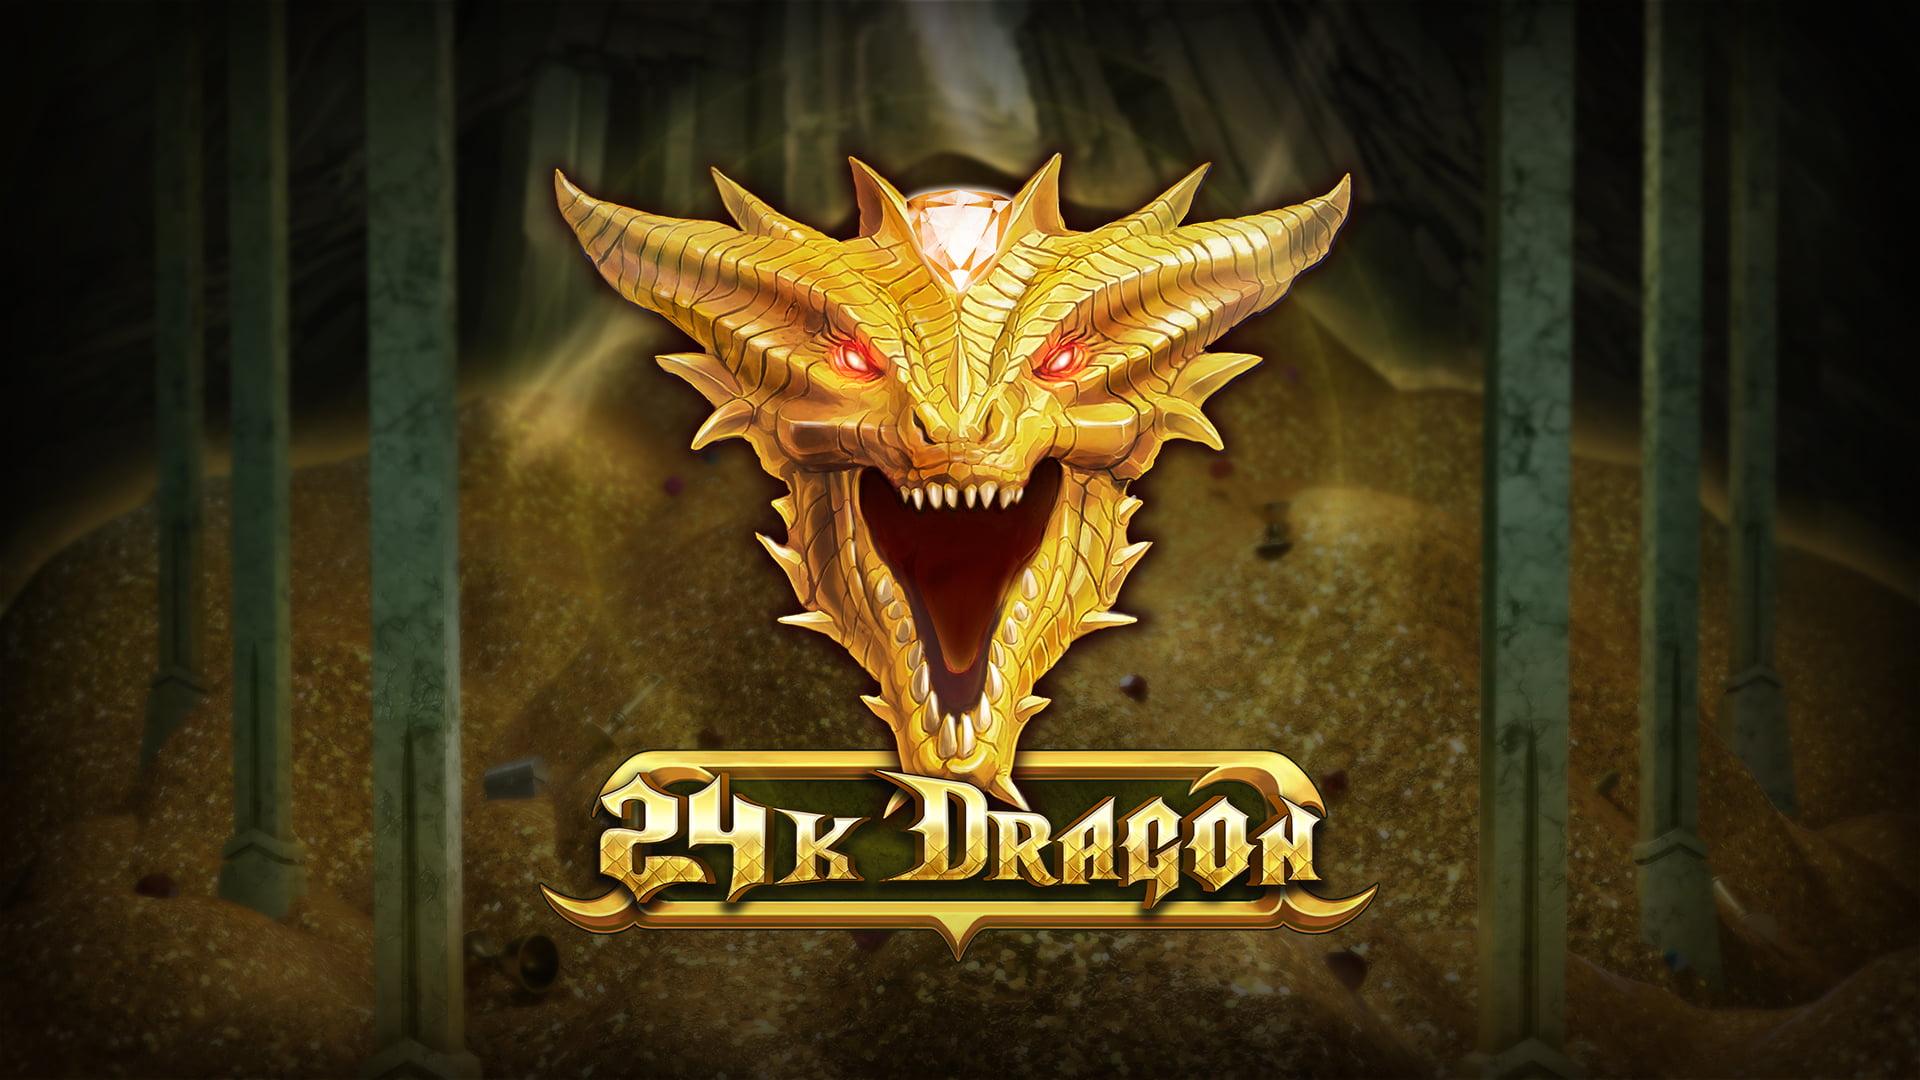 Play'n GO Release 24K Dragon Payway Slot